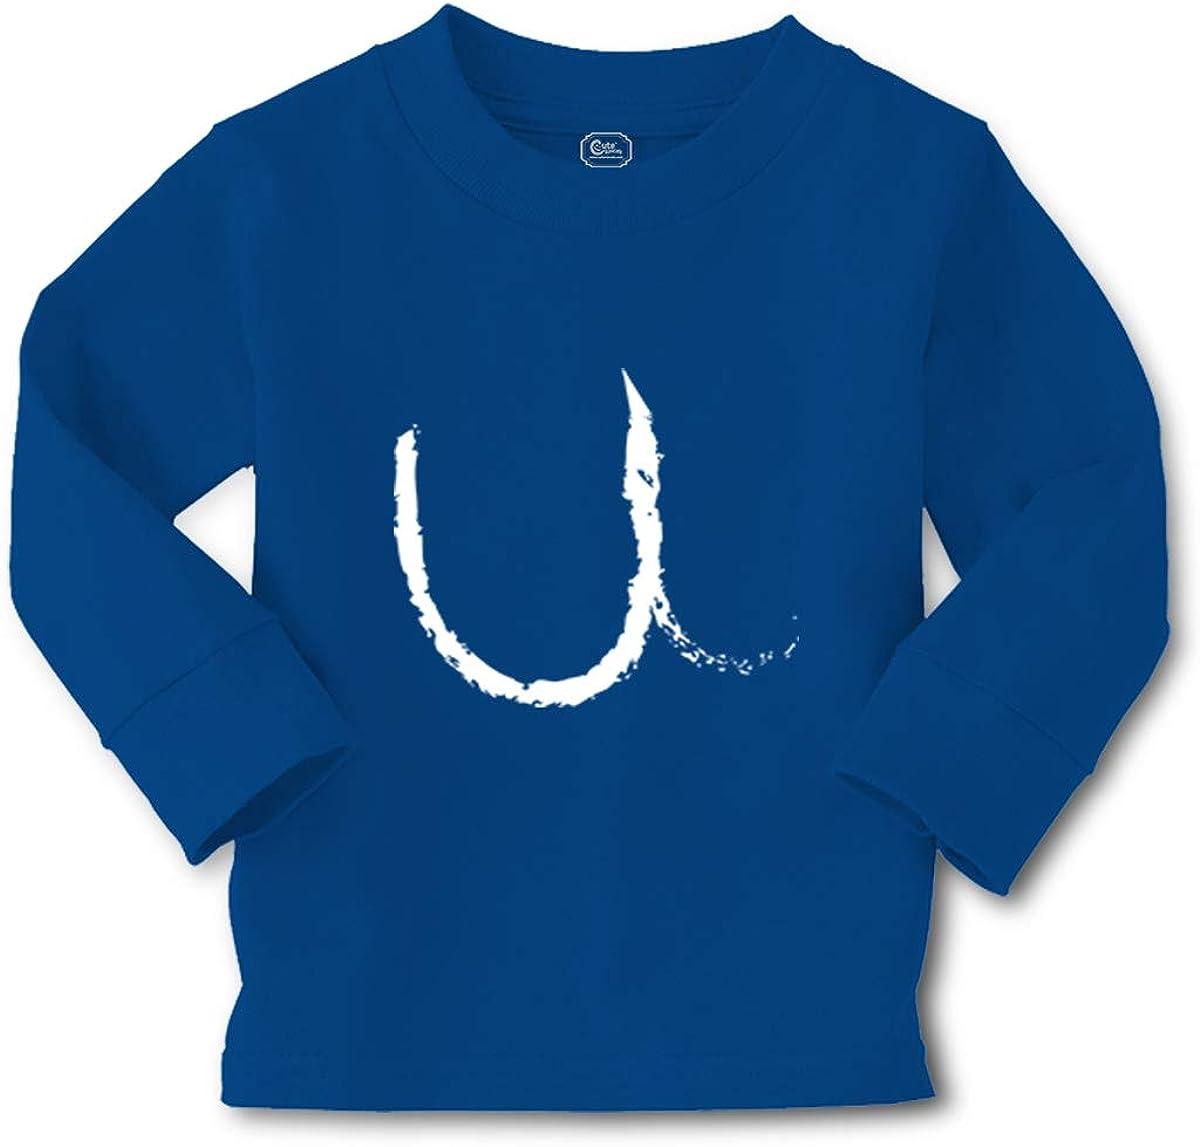 Cute Rascals Kids Long Sleeve T Shirt Small U School Cotton Boy & Girl Clothes